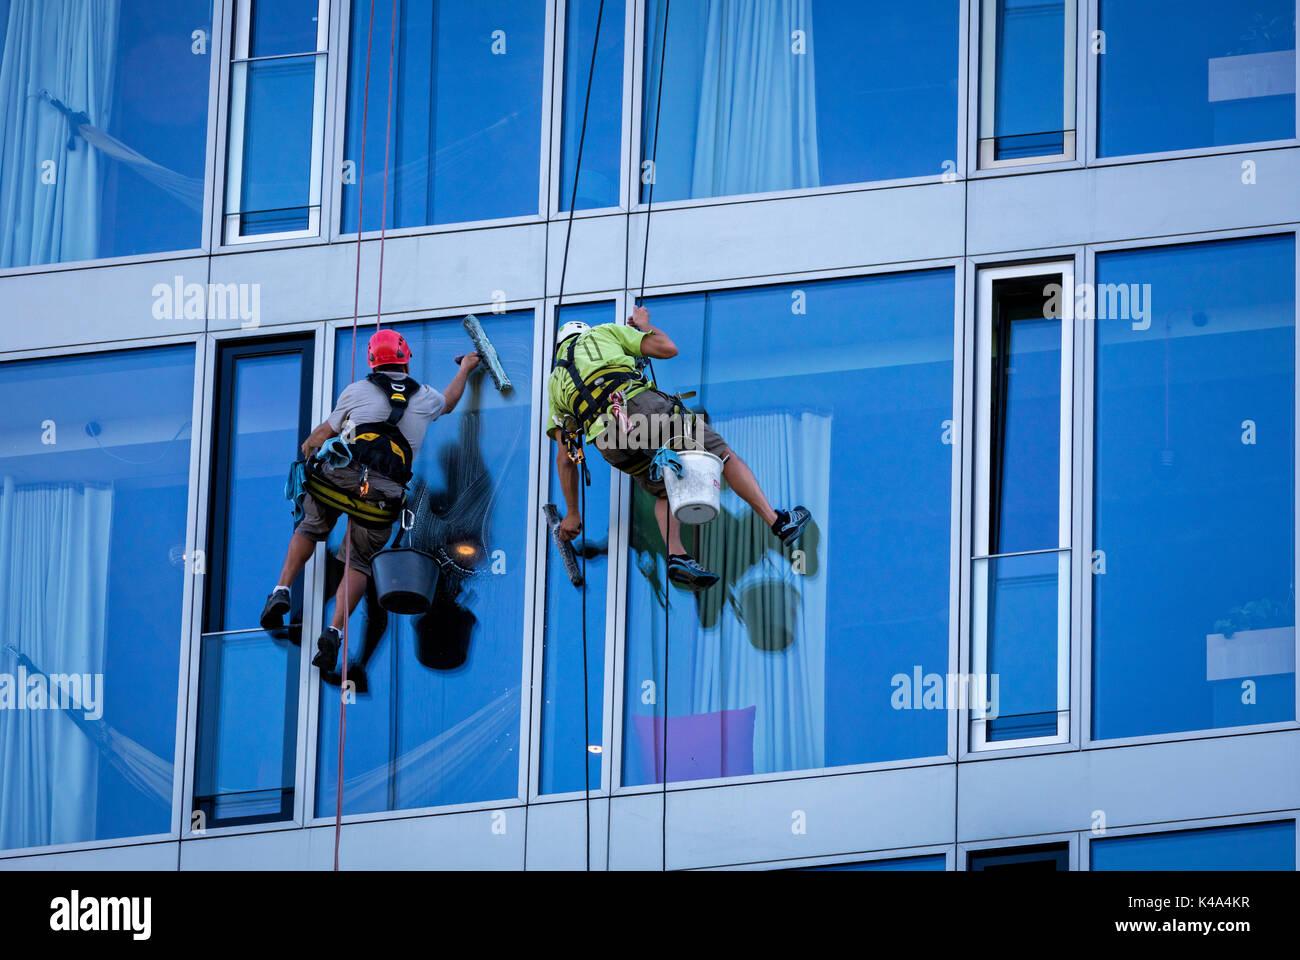 Fenster Reiniger Stockfoto Bild 157575147 Alamy